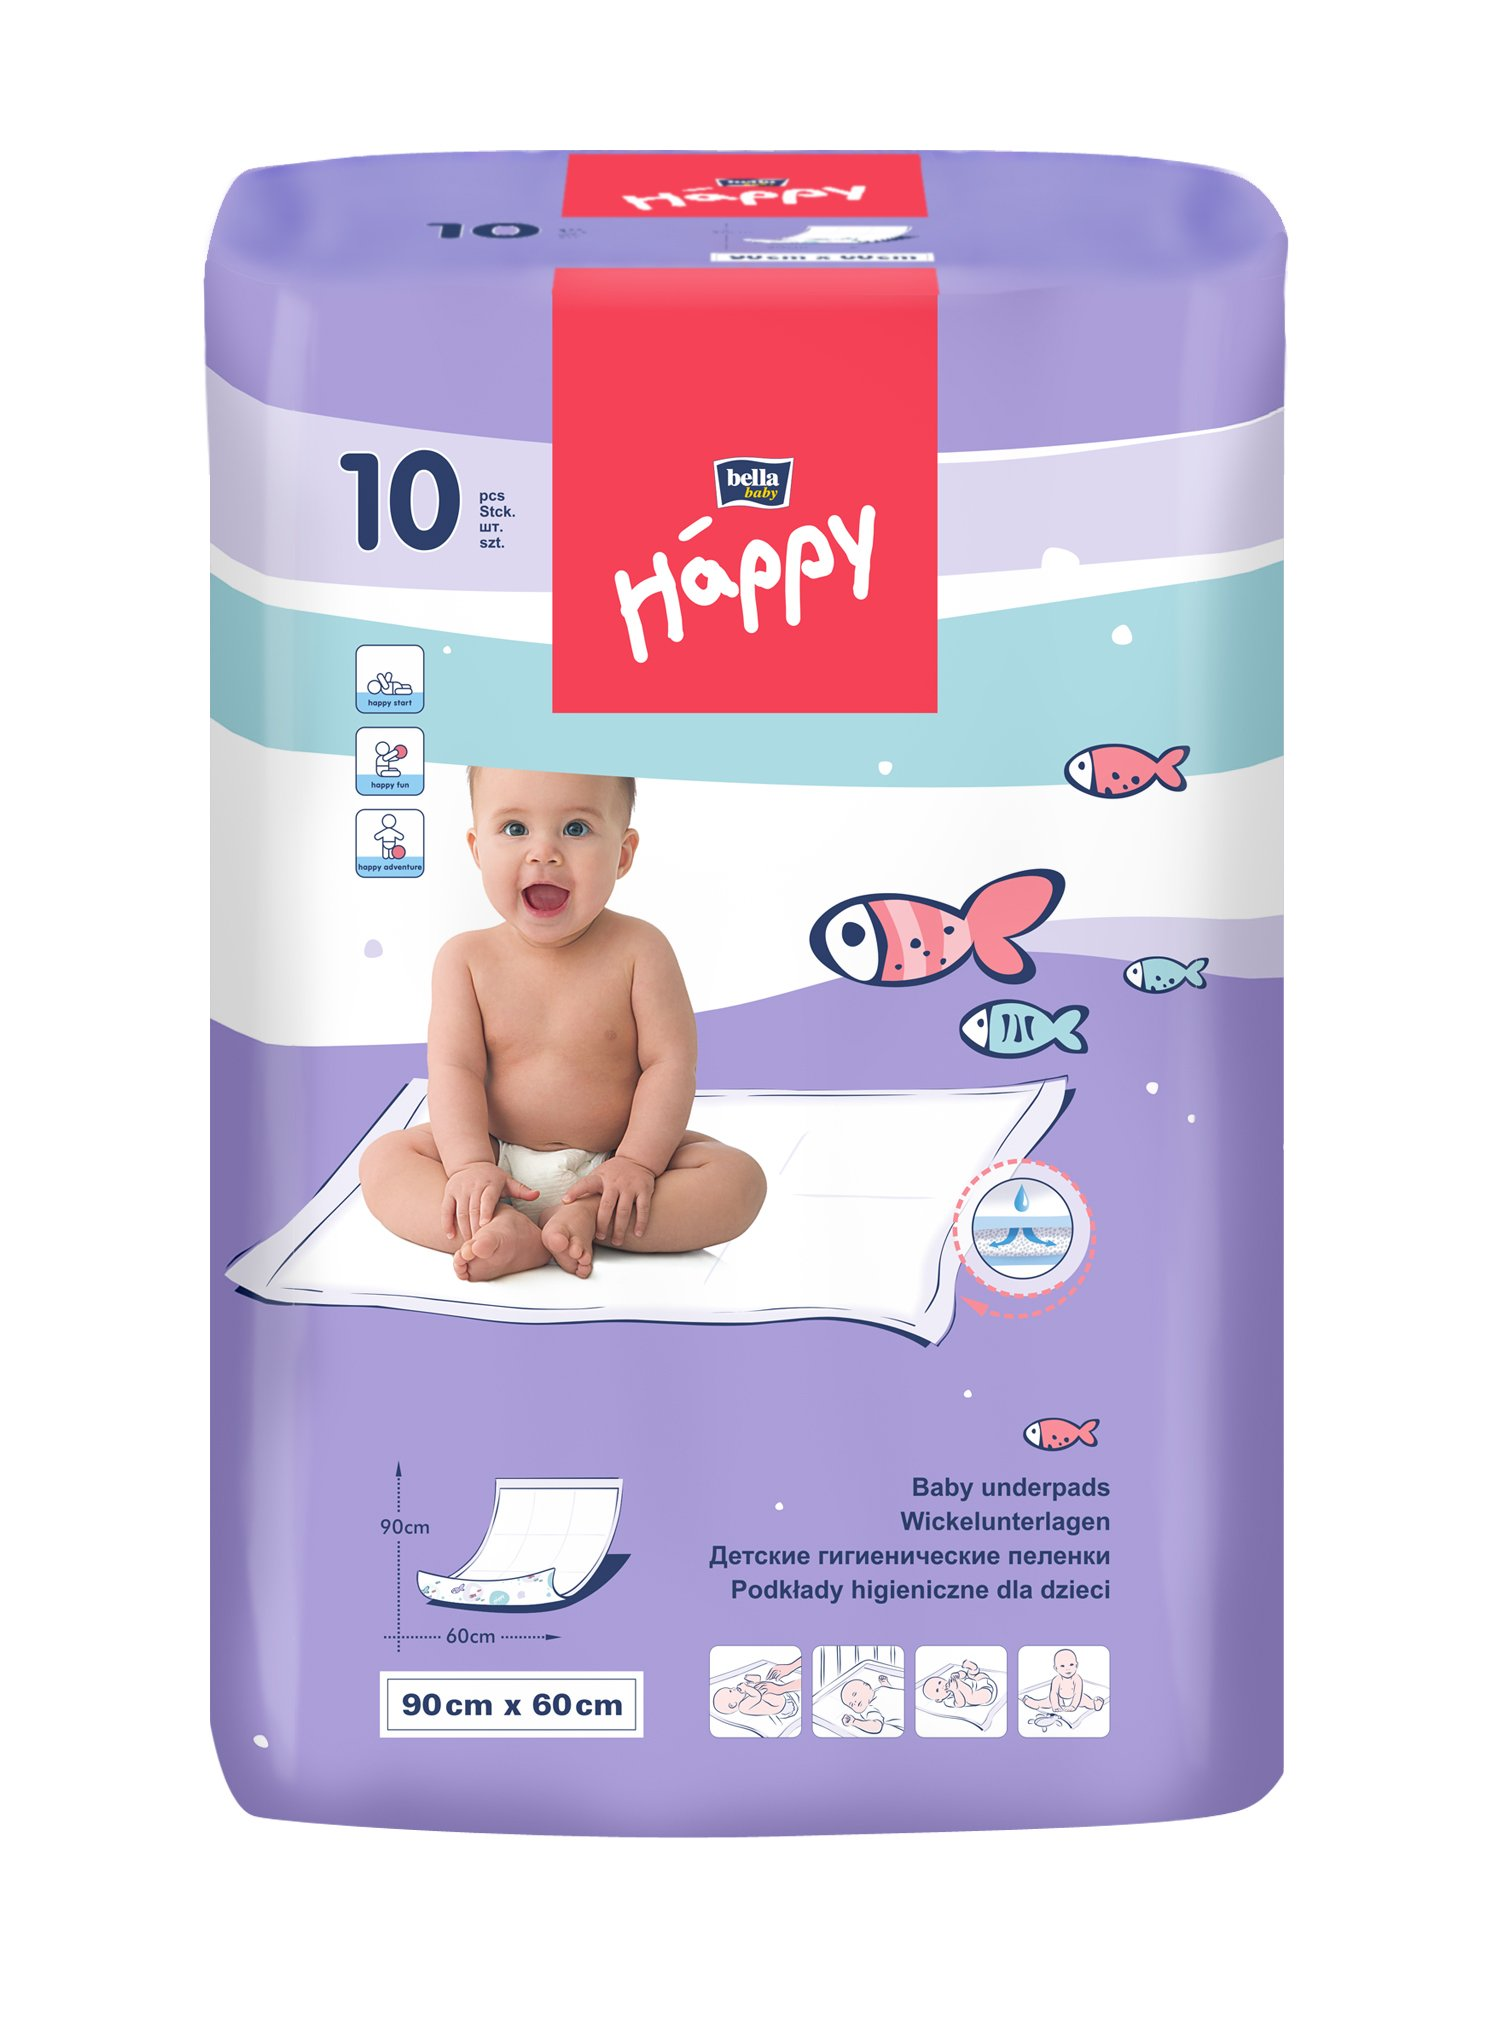 Bella bambino felice fasciatoi 90 x 60 cm, 4-Pack (4 x 10 pezzi)